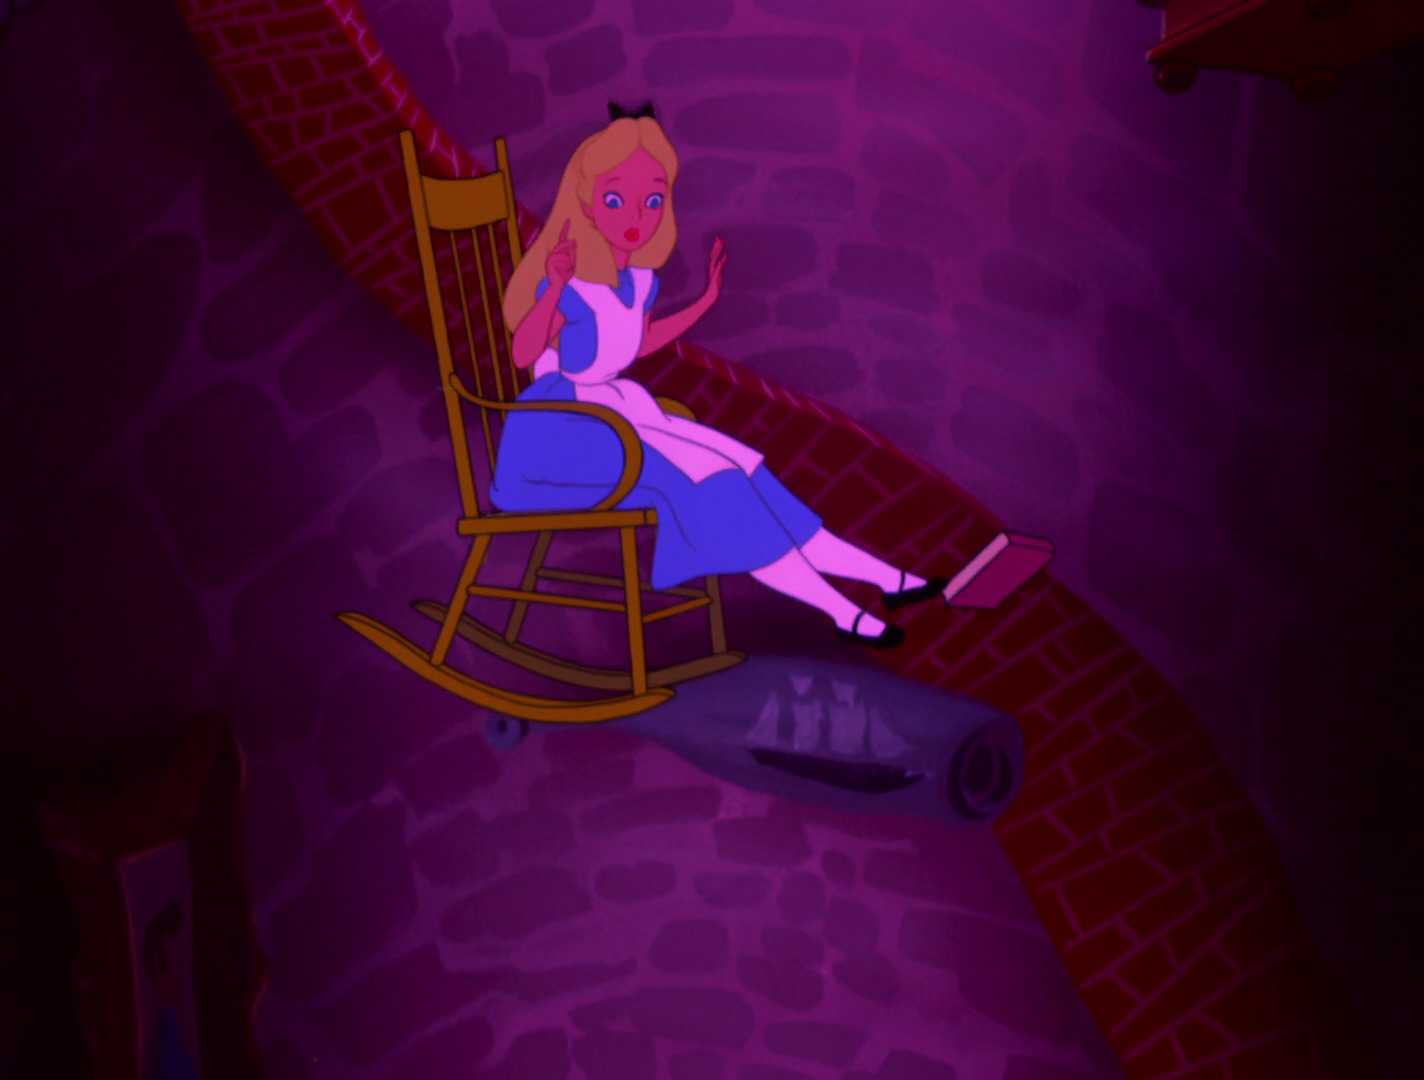 Image Alice In Wonderland Disneyscreencaps Com 603 Jpg